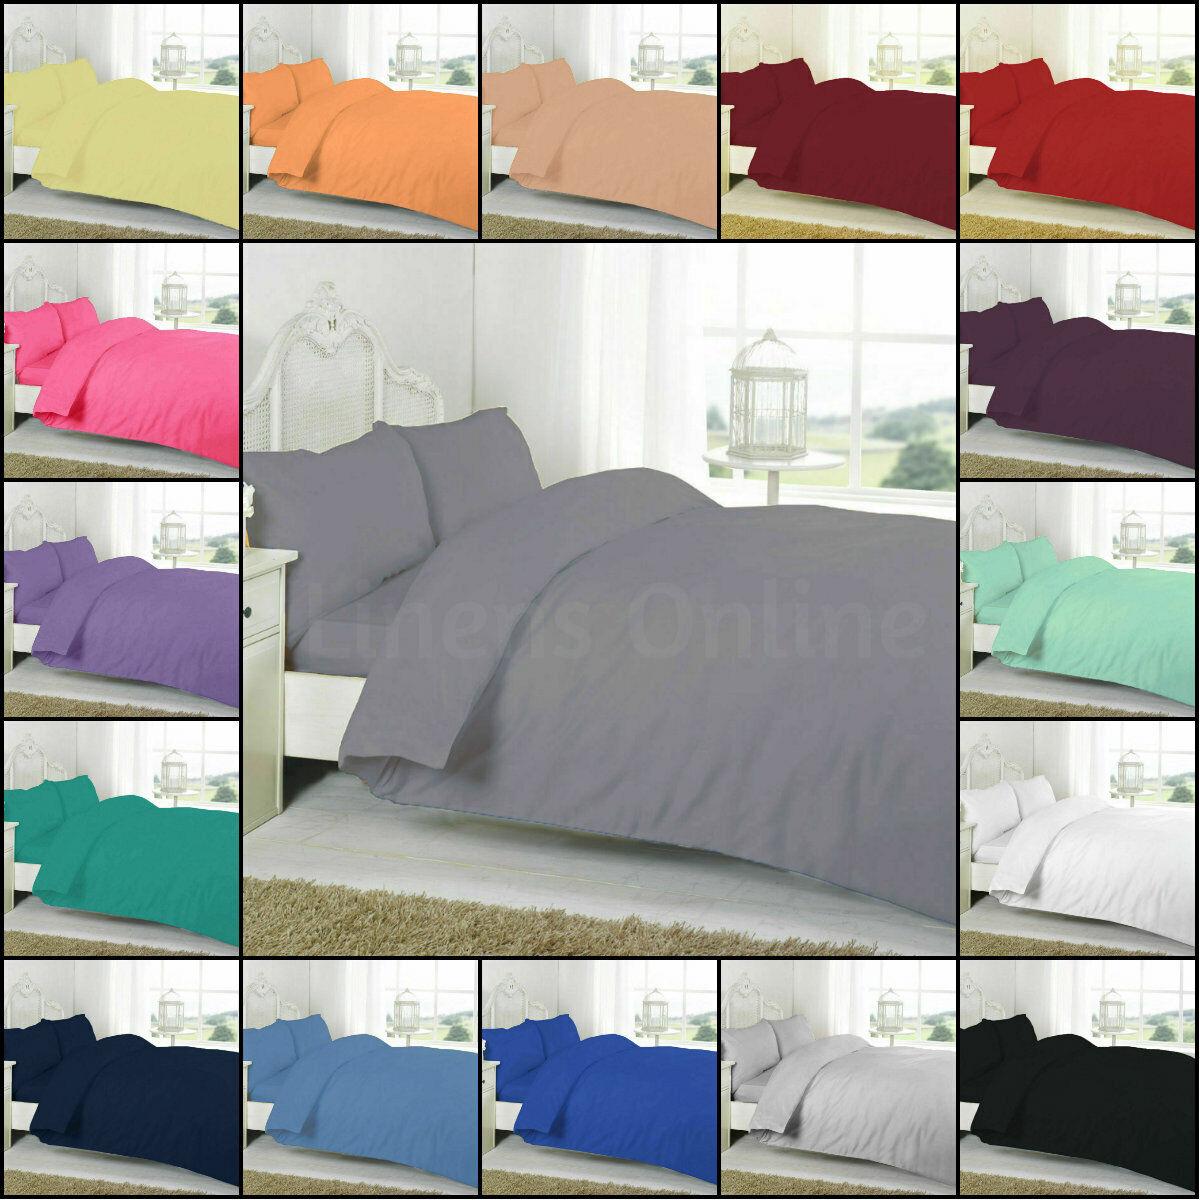 Rapport Asha Set Emerald Double Duvet Cover Matching Pillowcase Pair Bedding For Sale Ebay